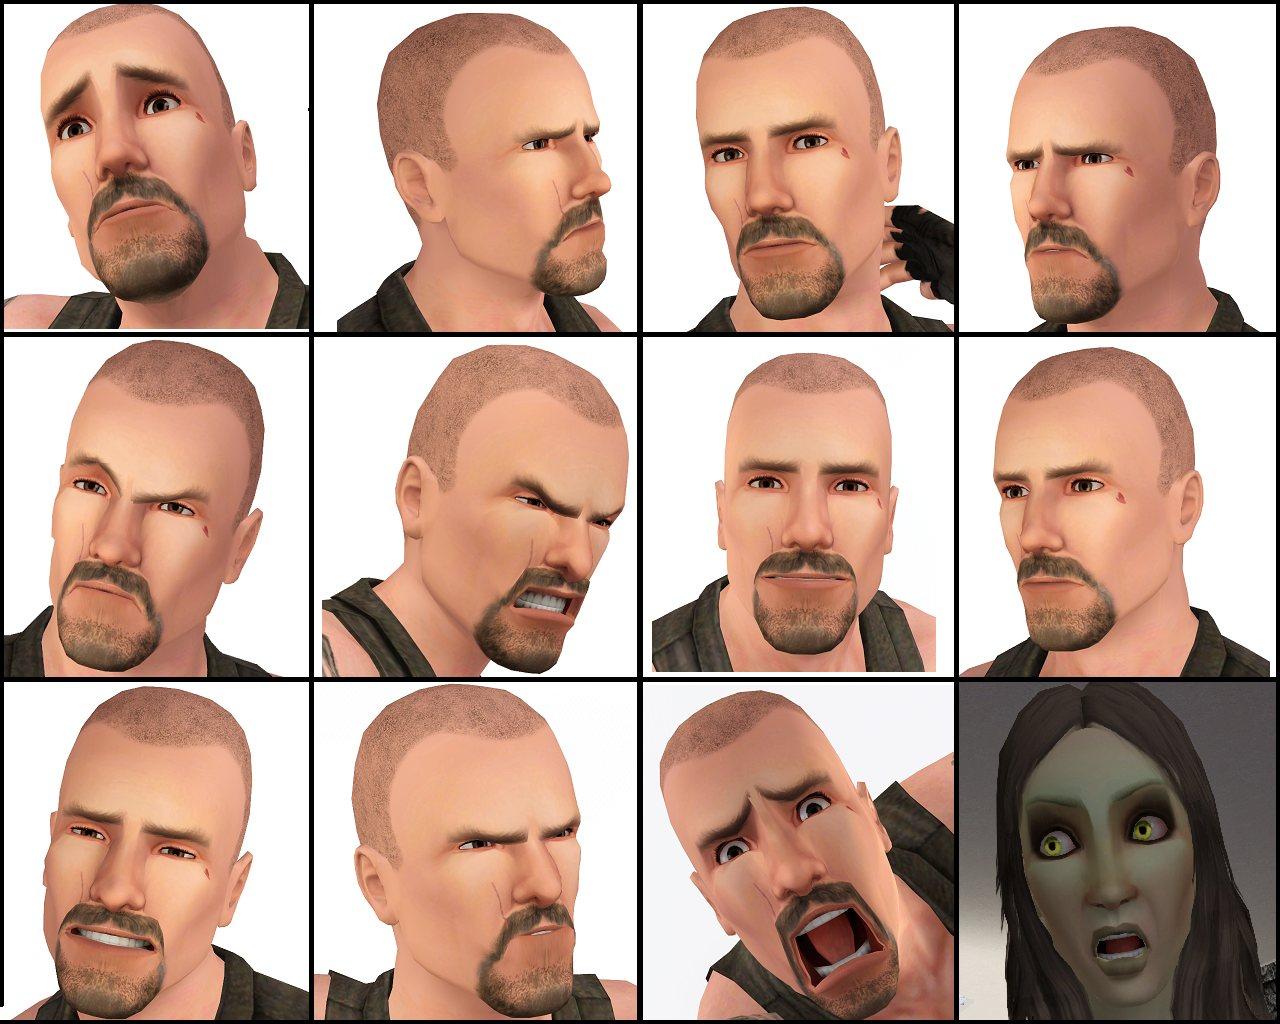 Mod The Sims - Francis - Left 4 Dead + his original tattoos